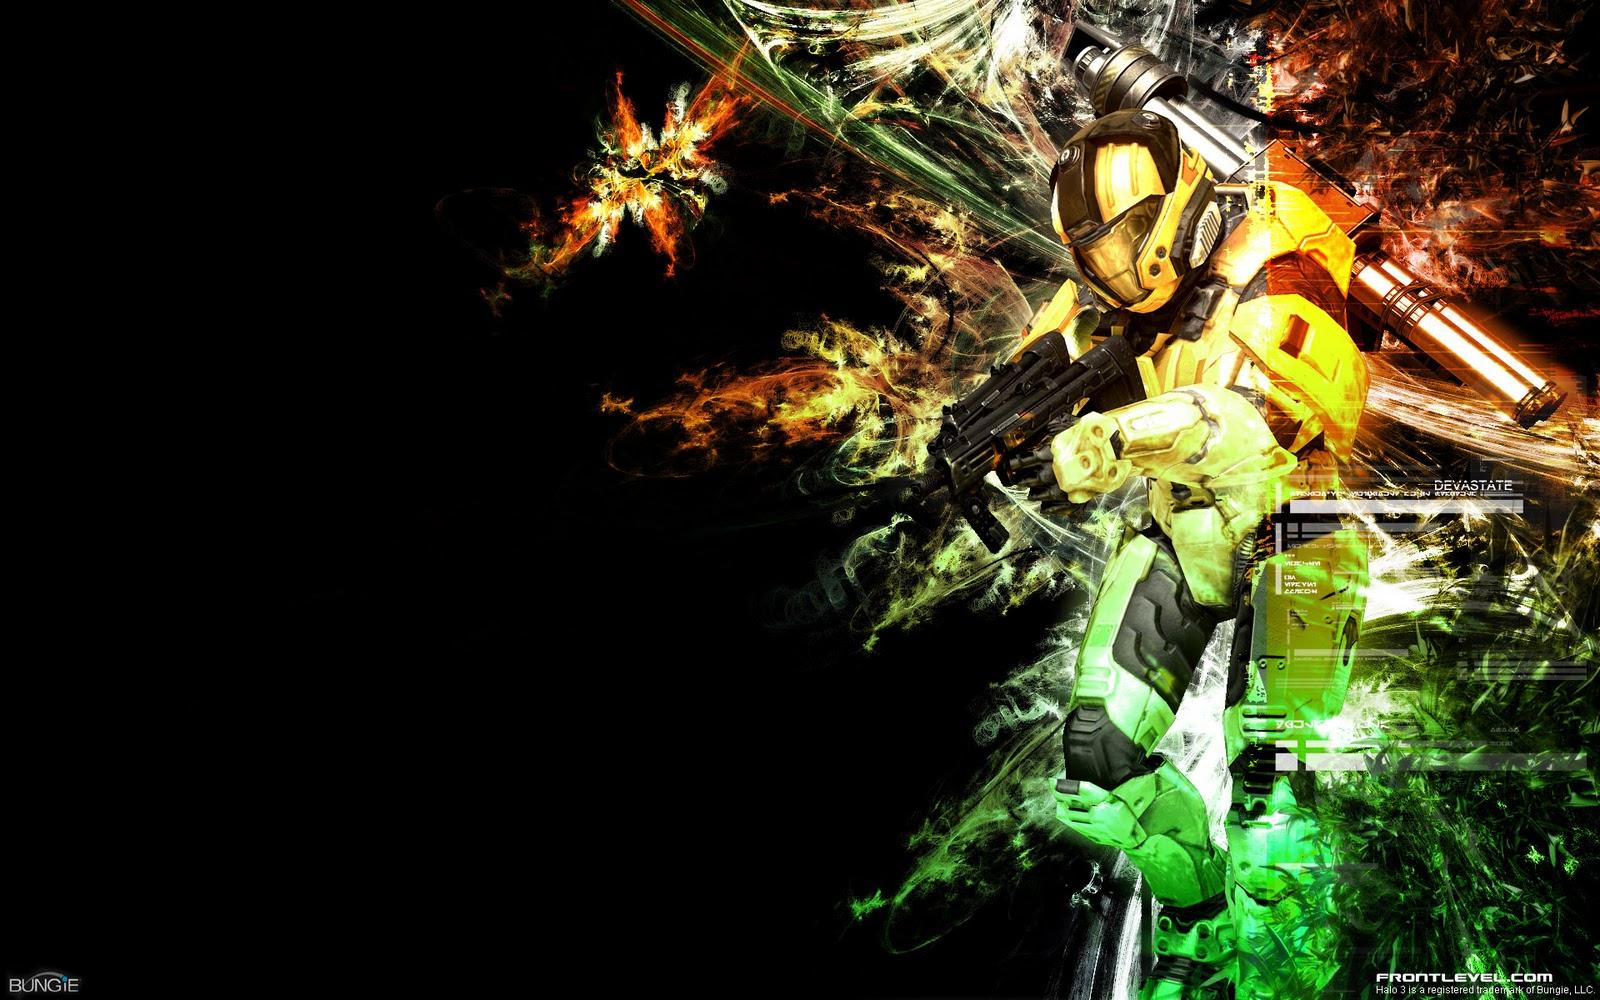 halo reach wallpaper 02589 halo reach wallpaper 025236 halo reach 1600x1000